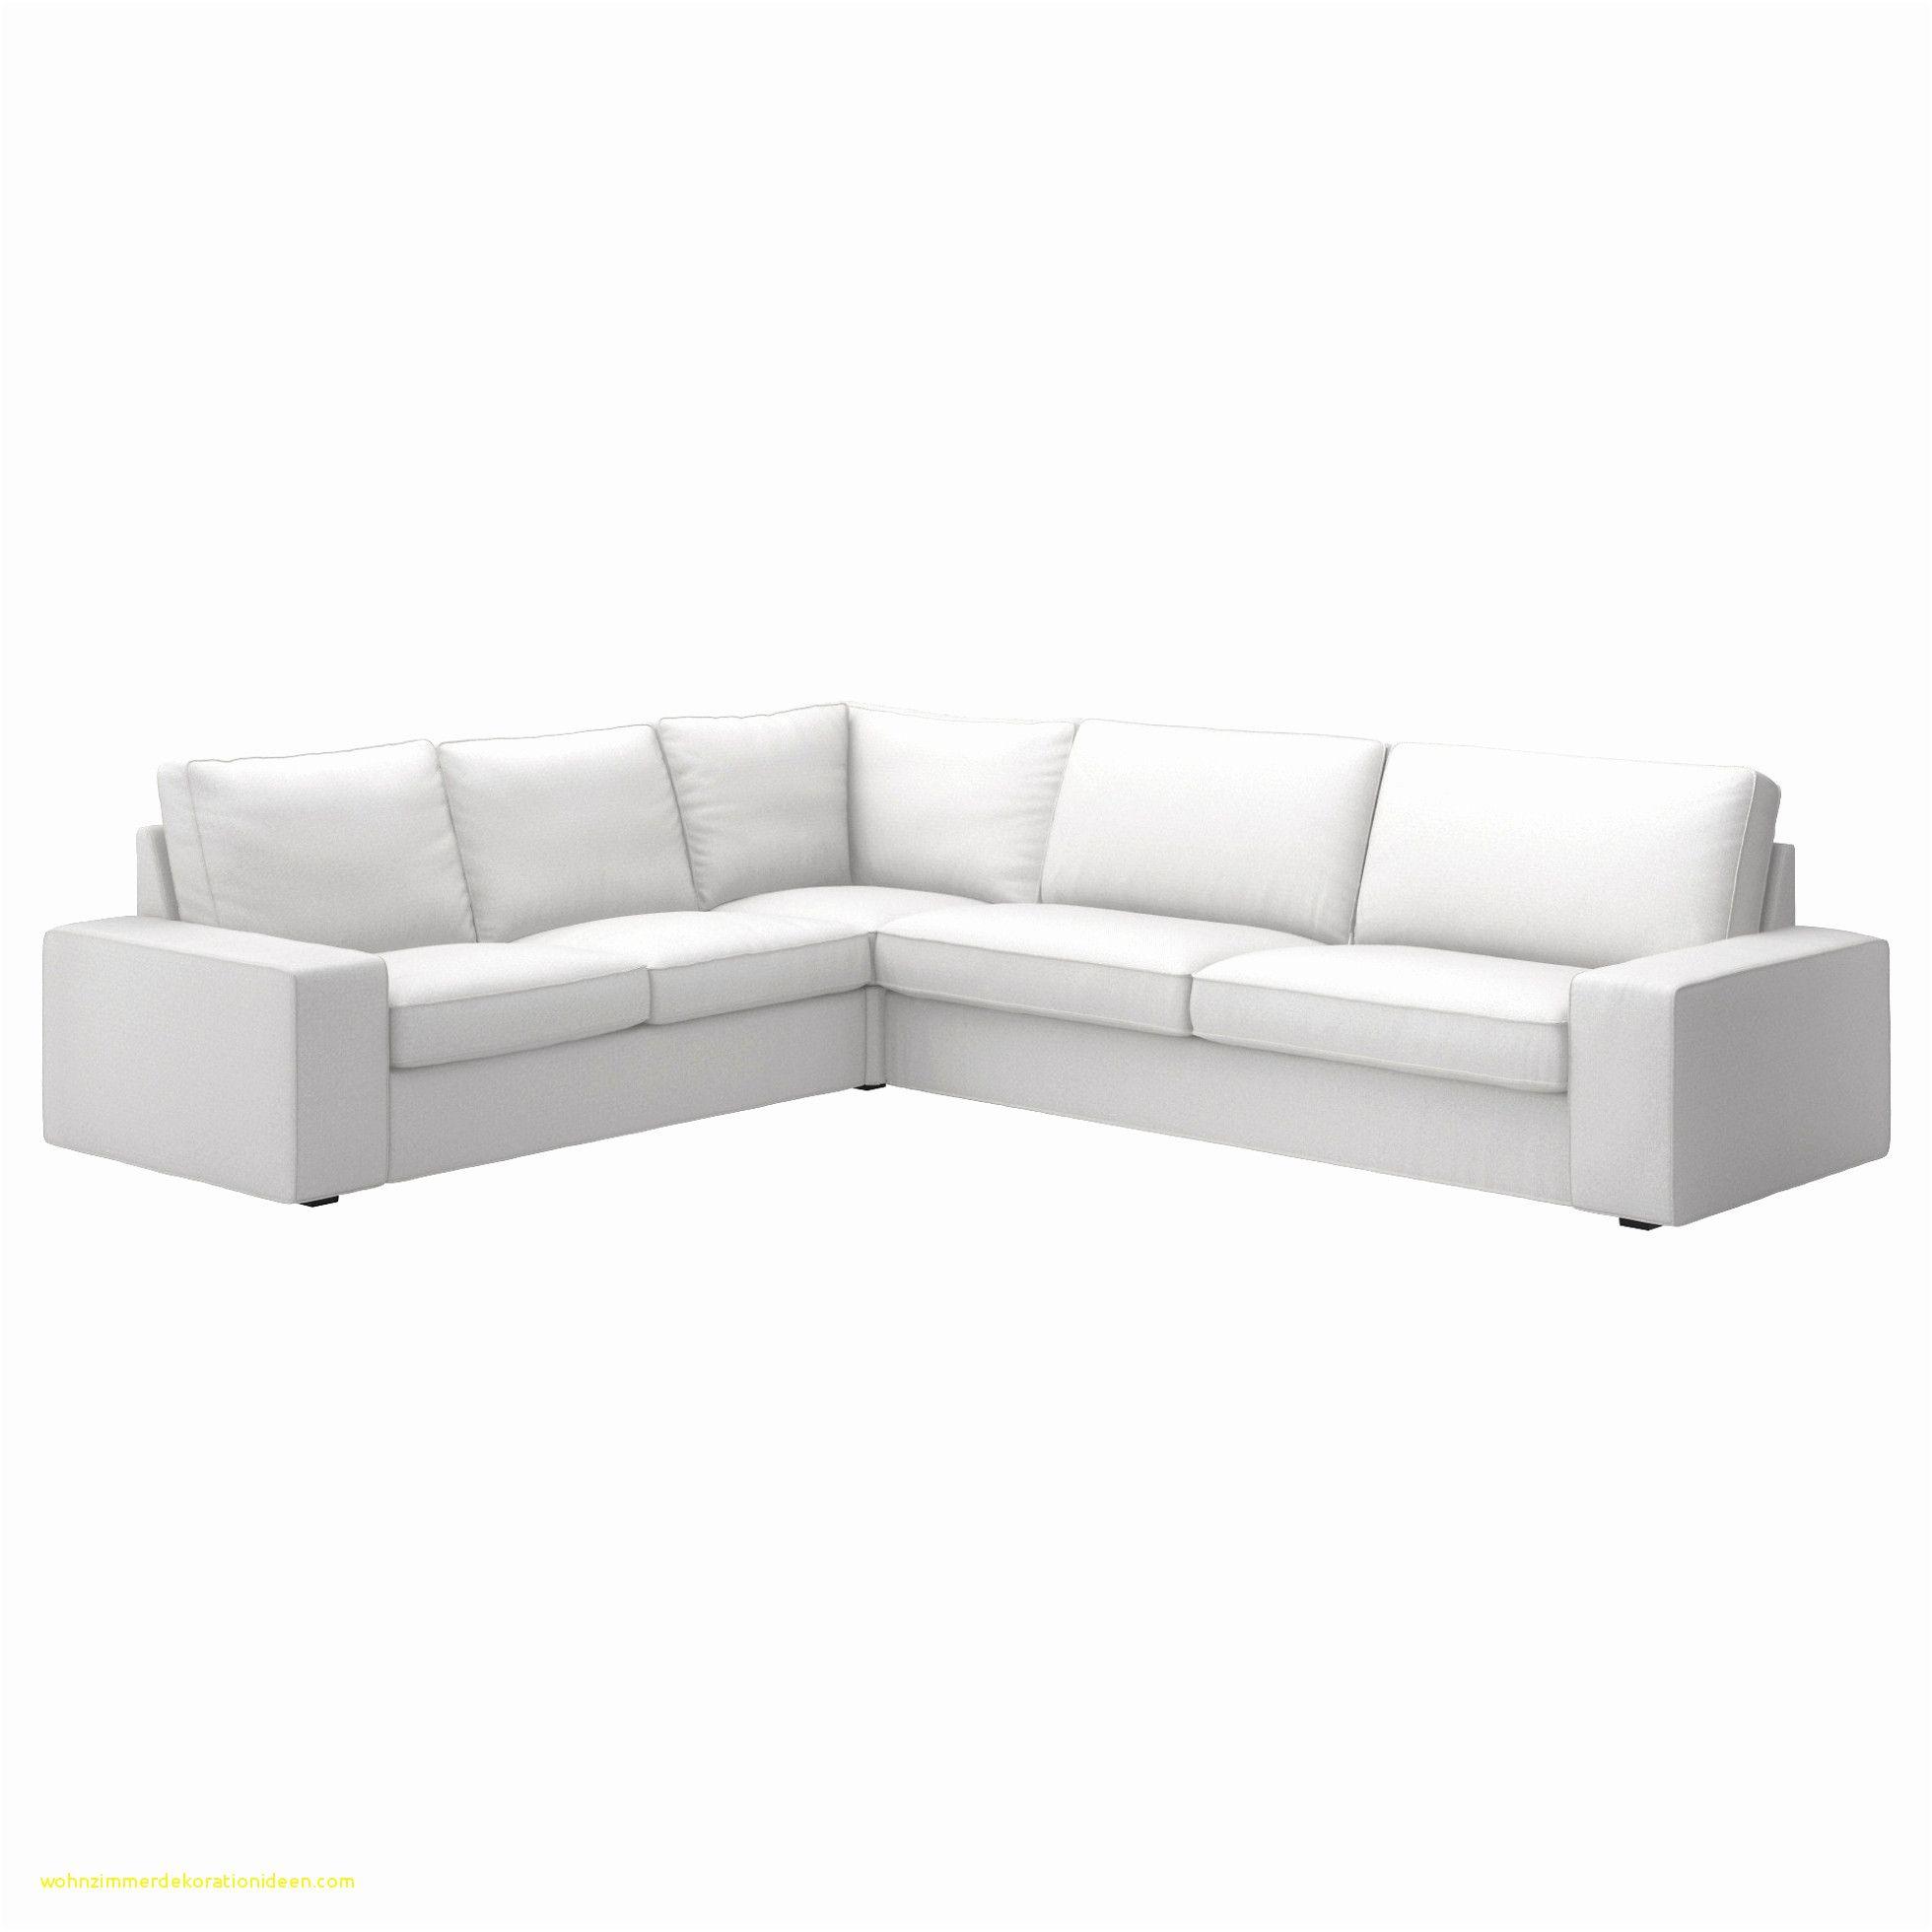 Komplett Eckcouch Mit Sessel Couch Möbel Couch